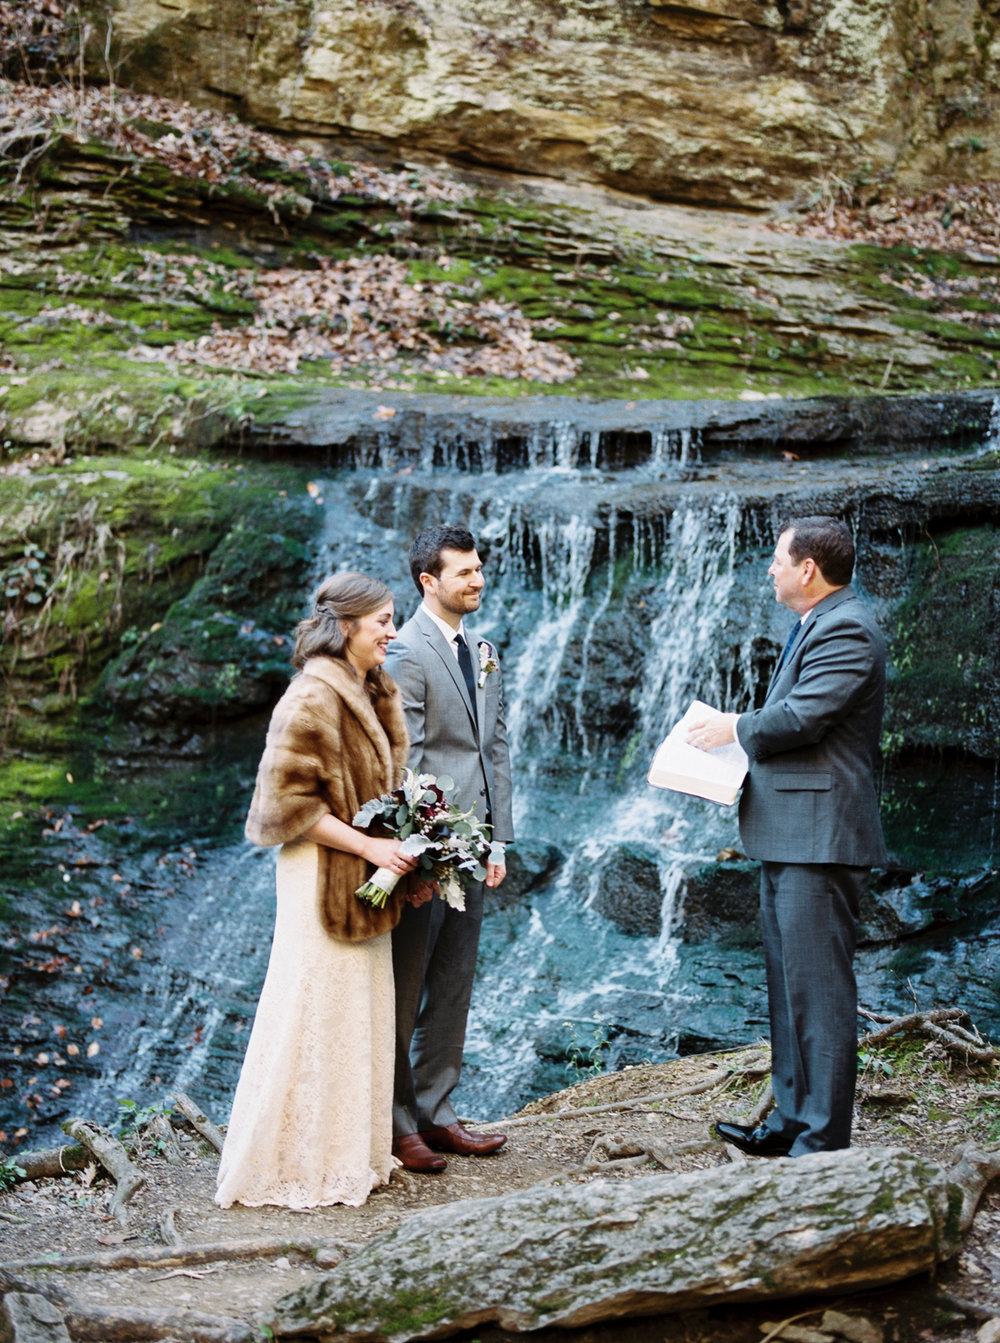 laurel+kelly_natchez_trace_grays_on_main_franklin_film_wedding_photographers©2017abigailbobophotography-8.jpg